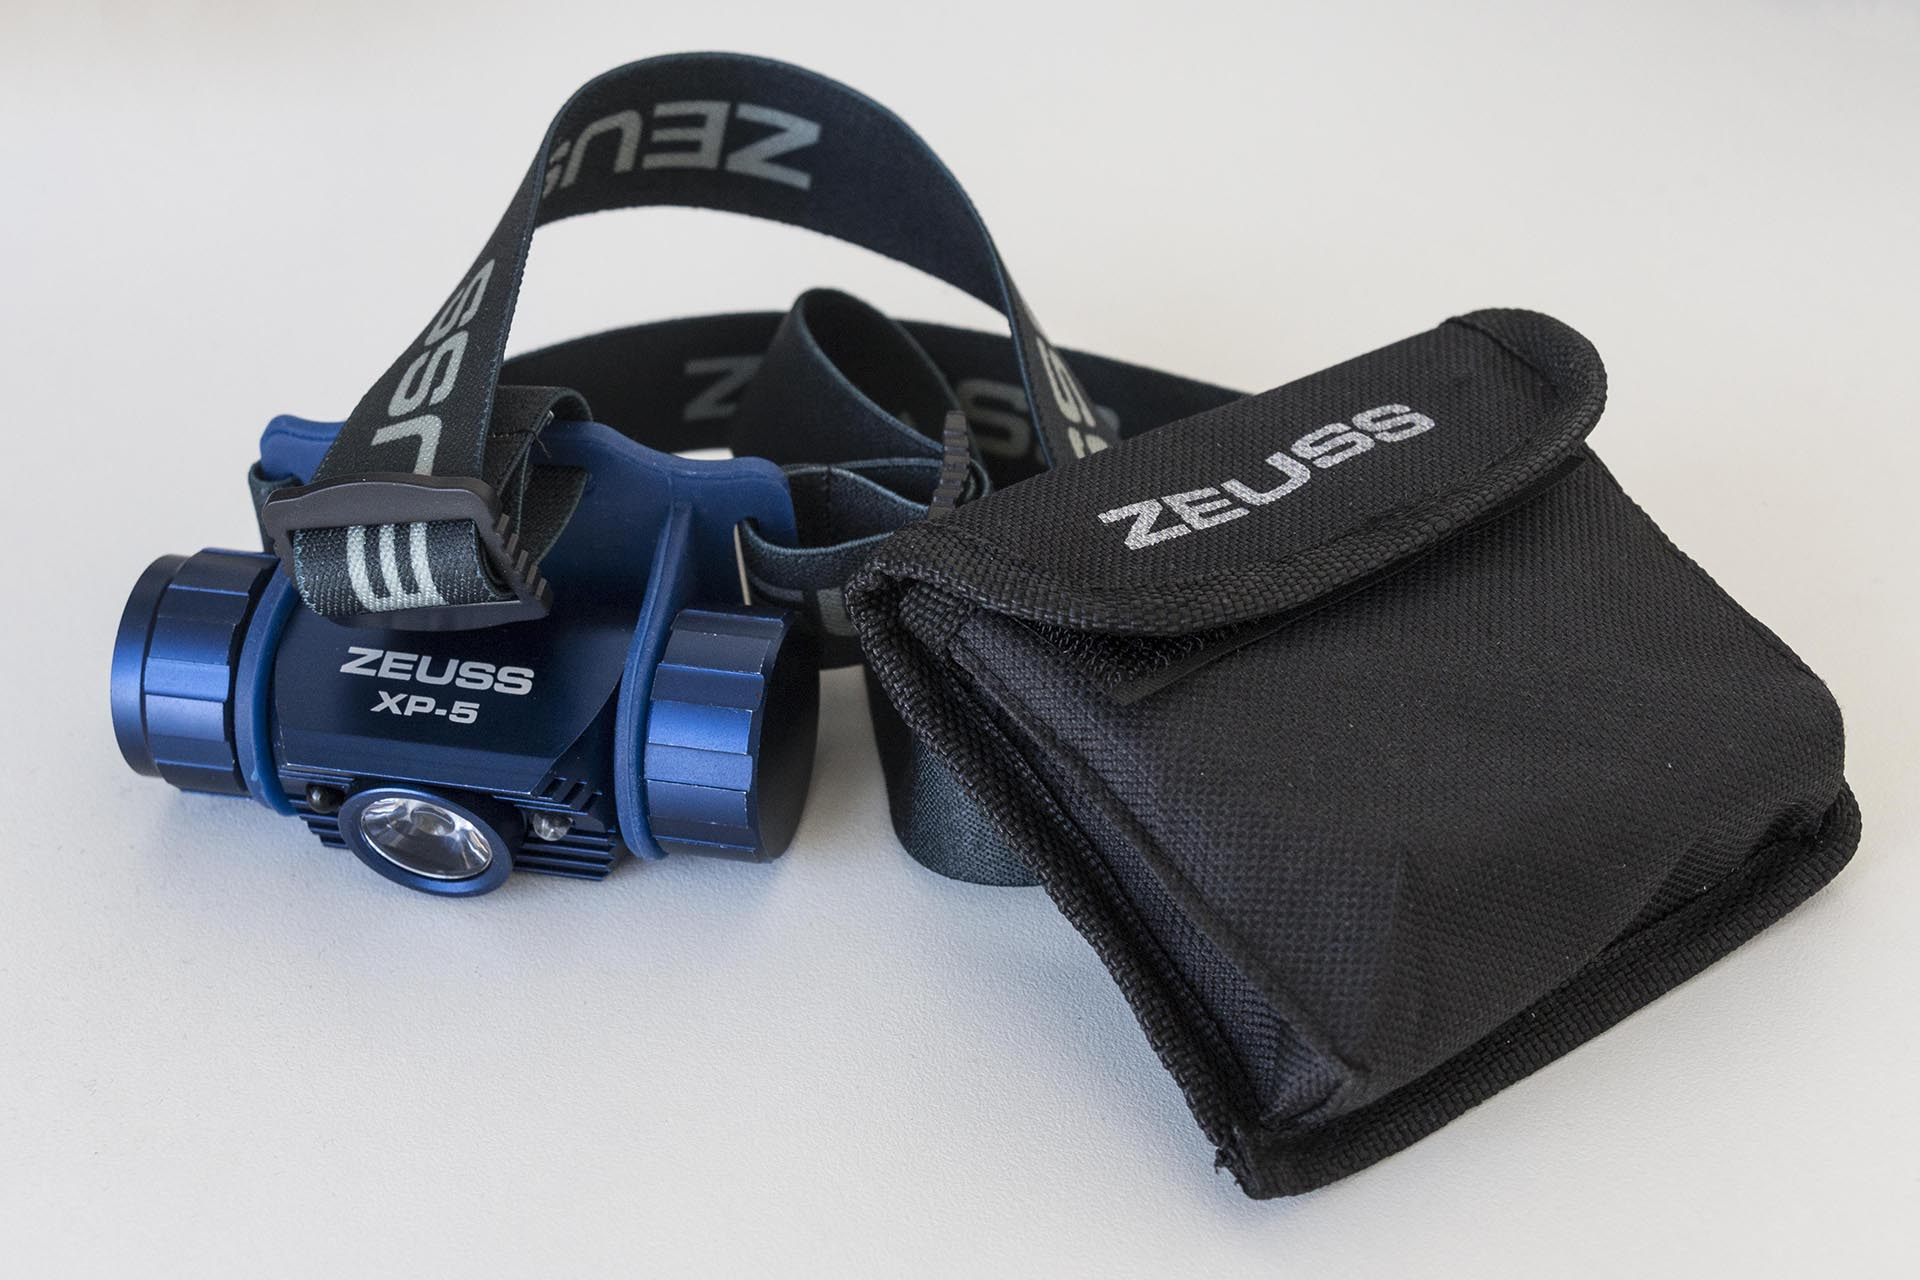 Zeuss XP-5 LED Headlamp_MG_0161